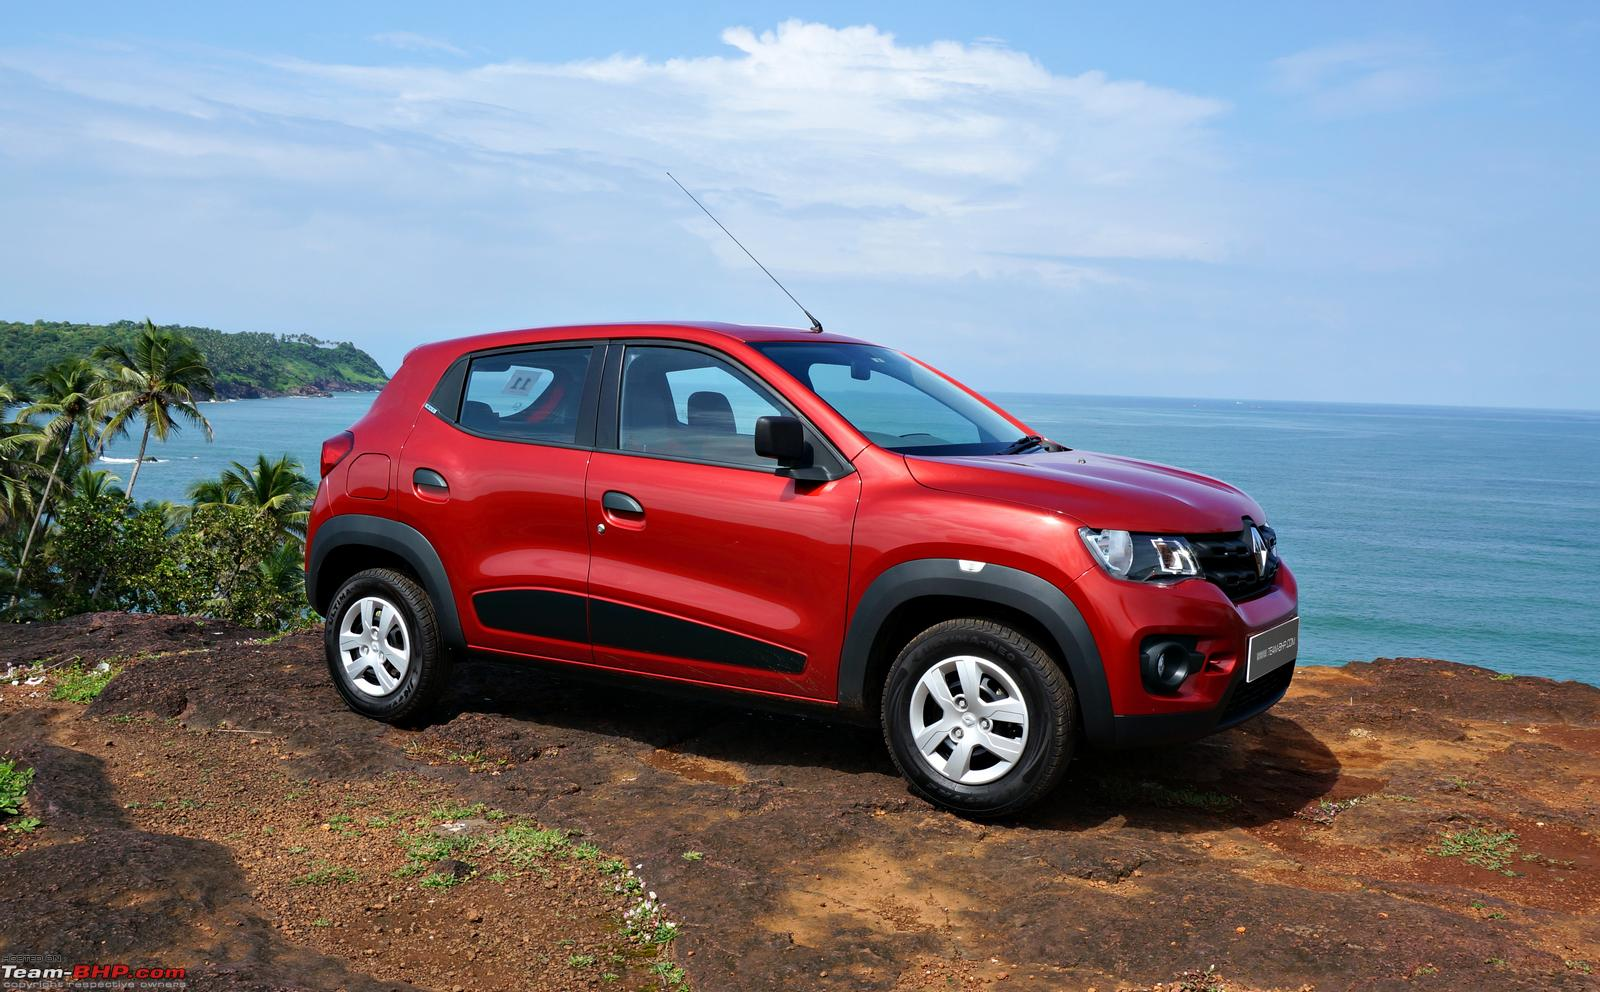 Budget hatchback war: Renault Kwid vs the others - Team-BHP